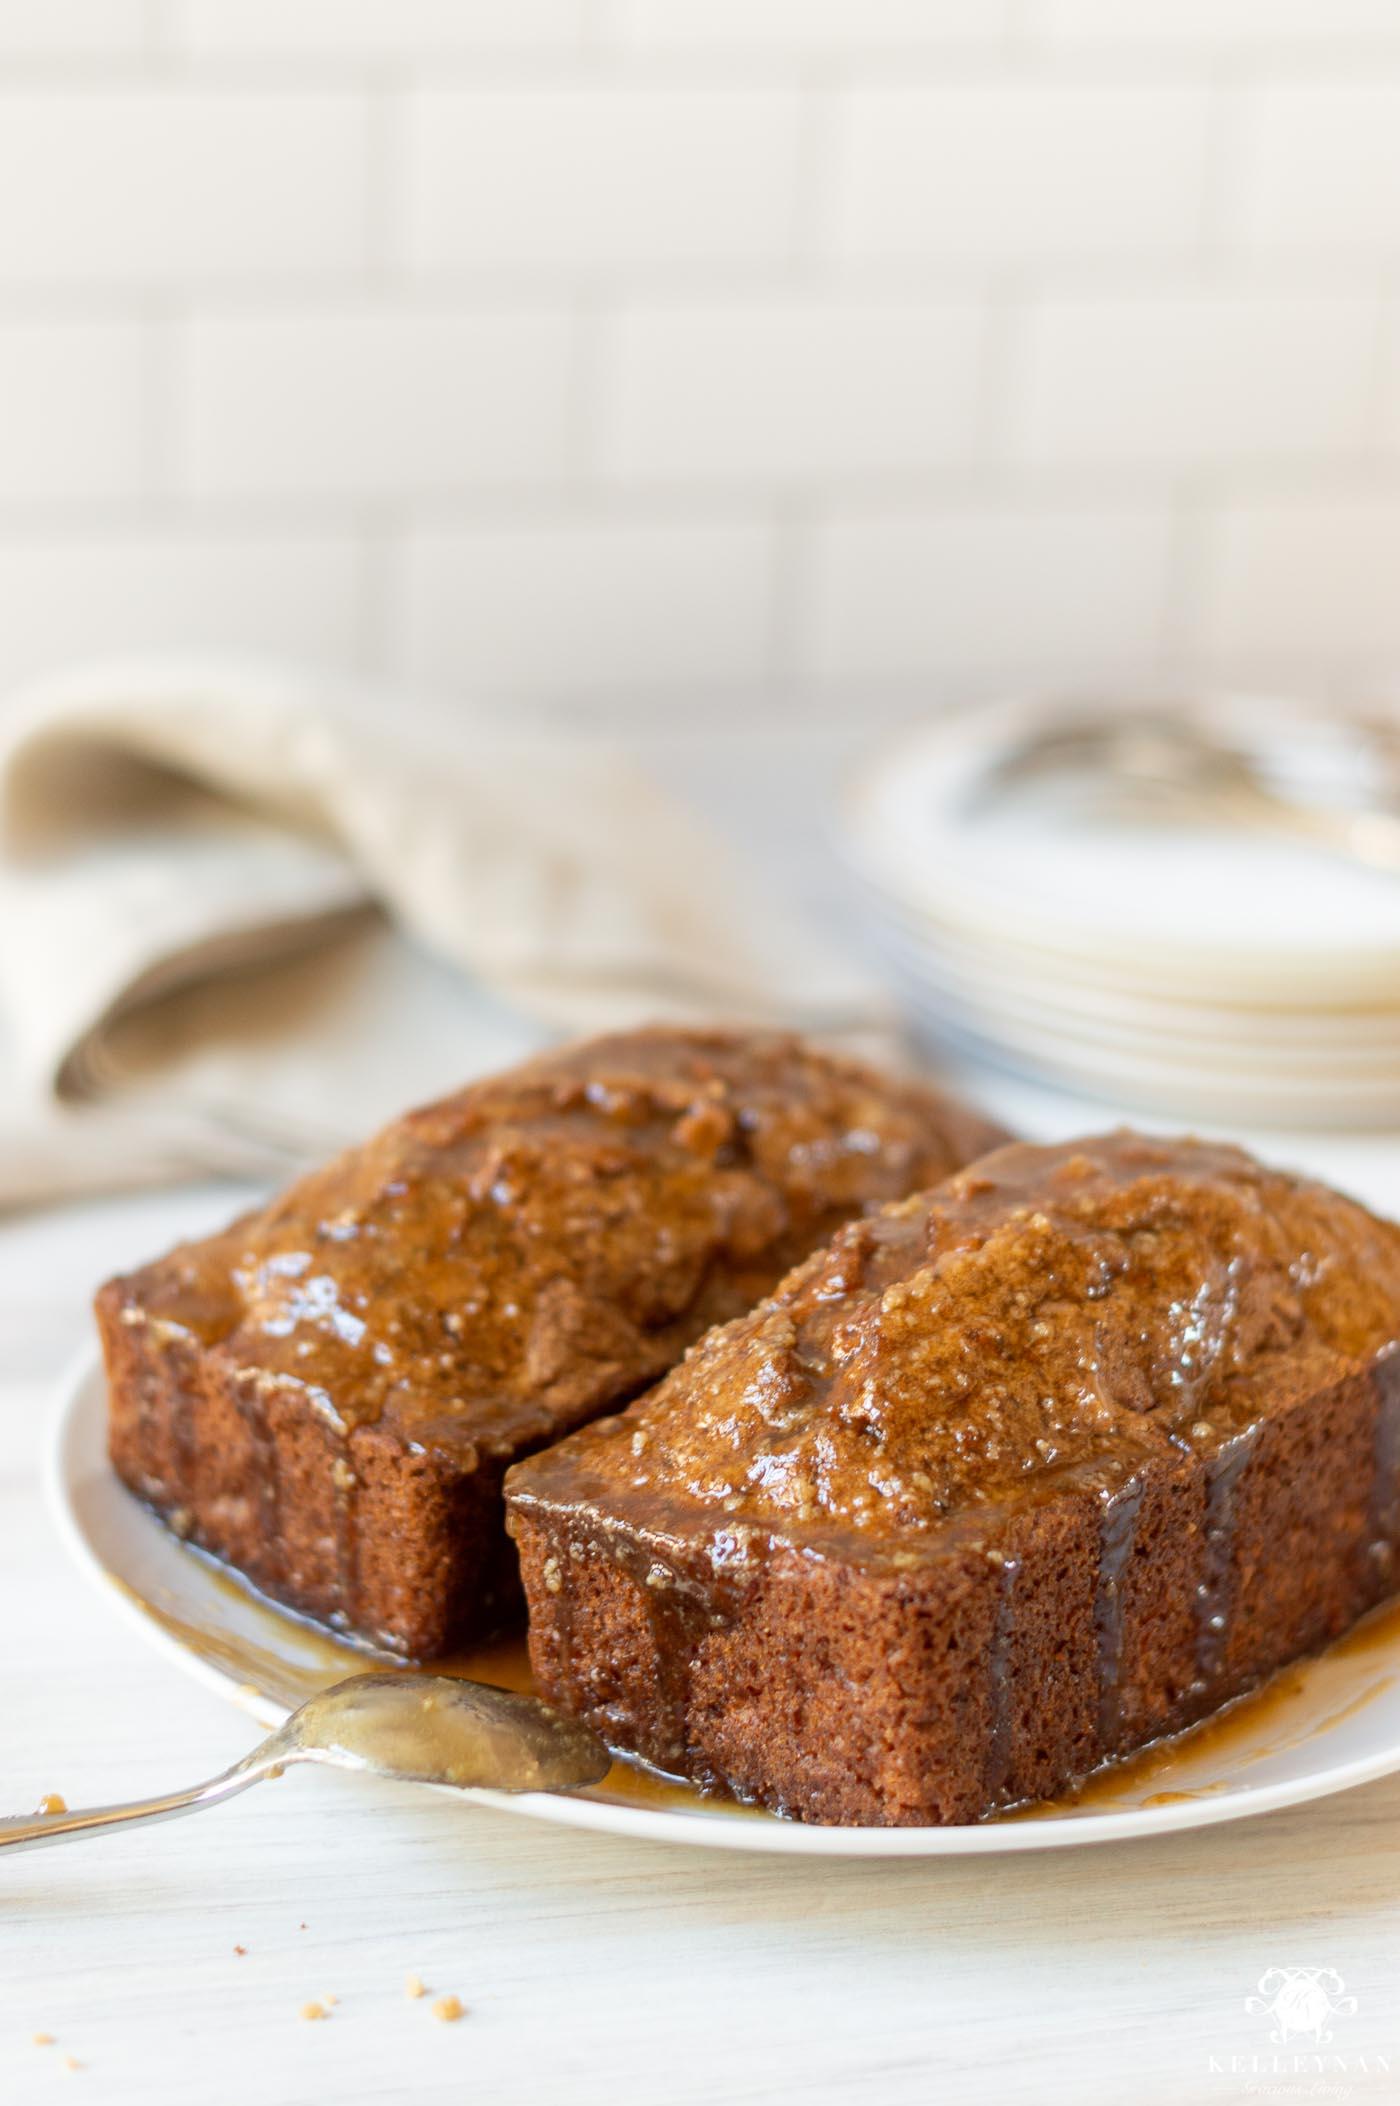 Apple Cake with Caramel Glaze Recipe